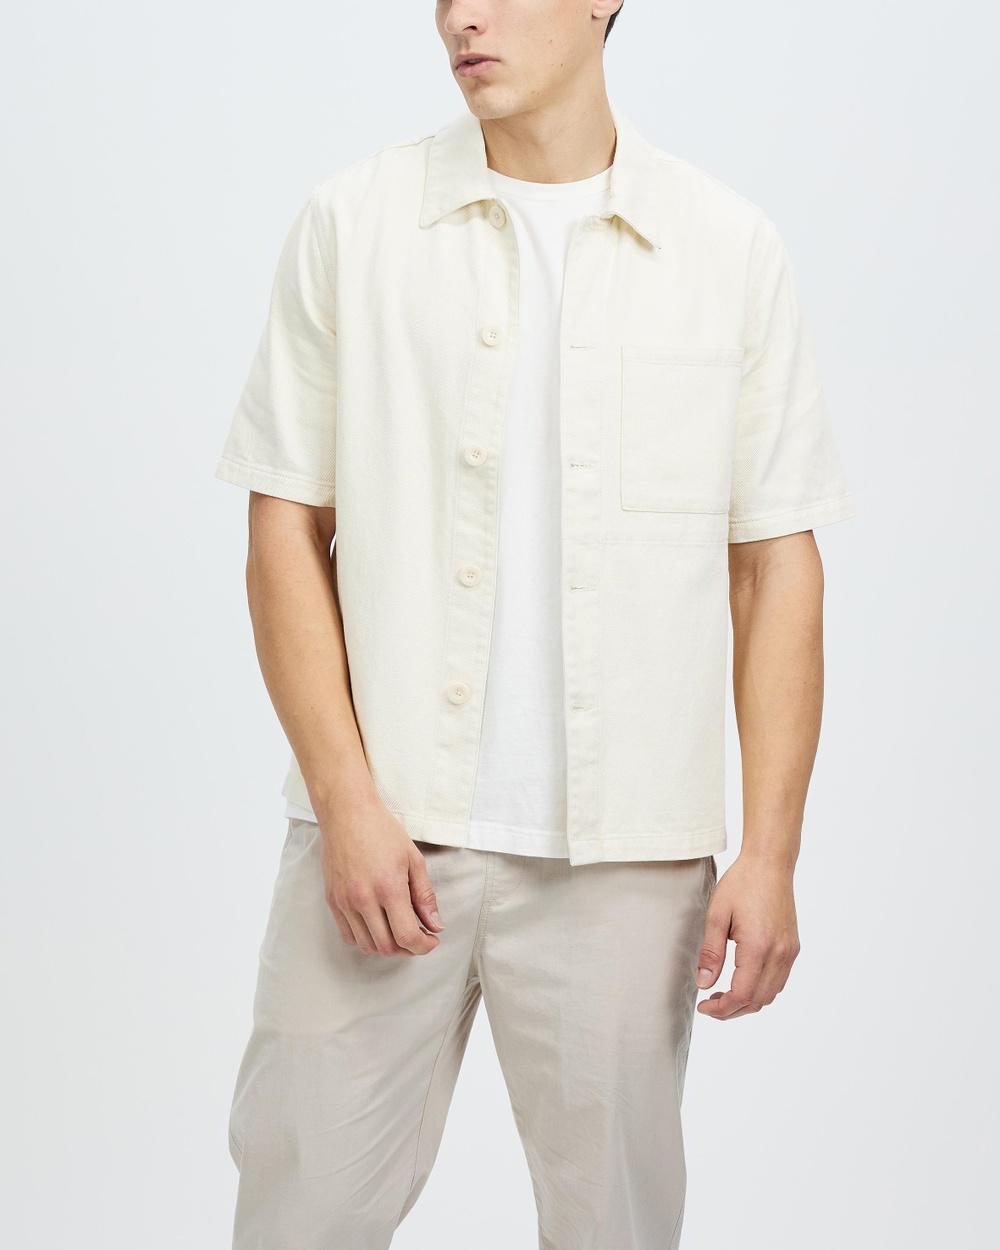 AERE Organic Twill SS Overshirt Casual shirts White